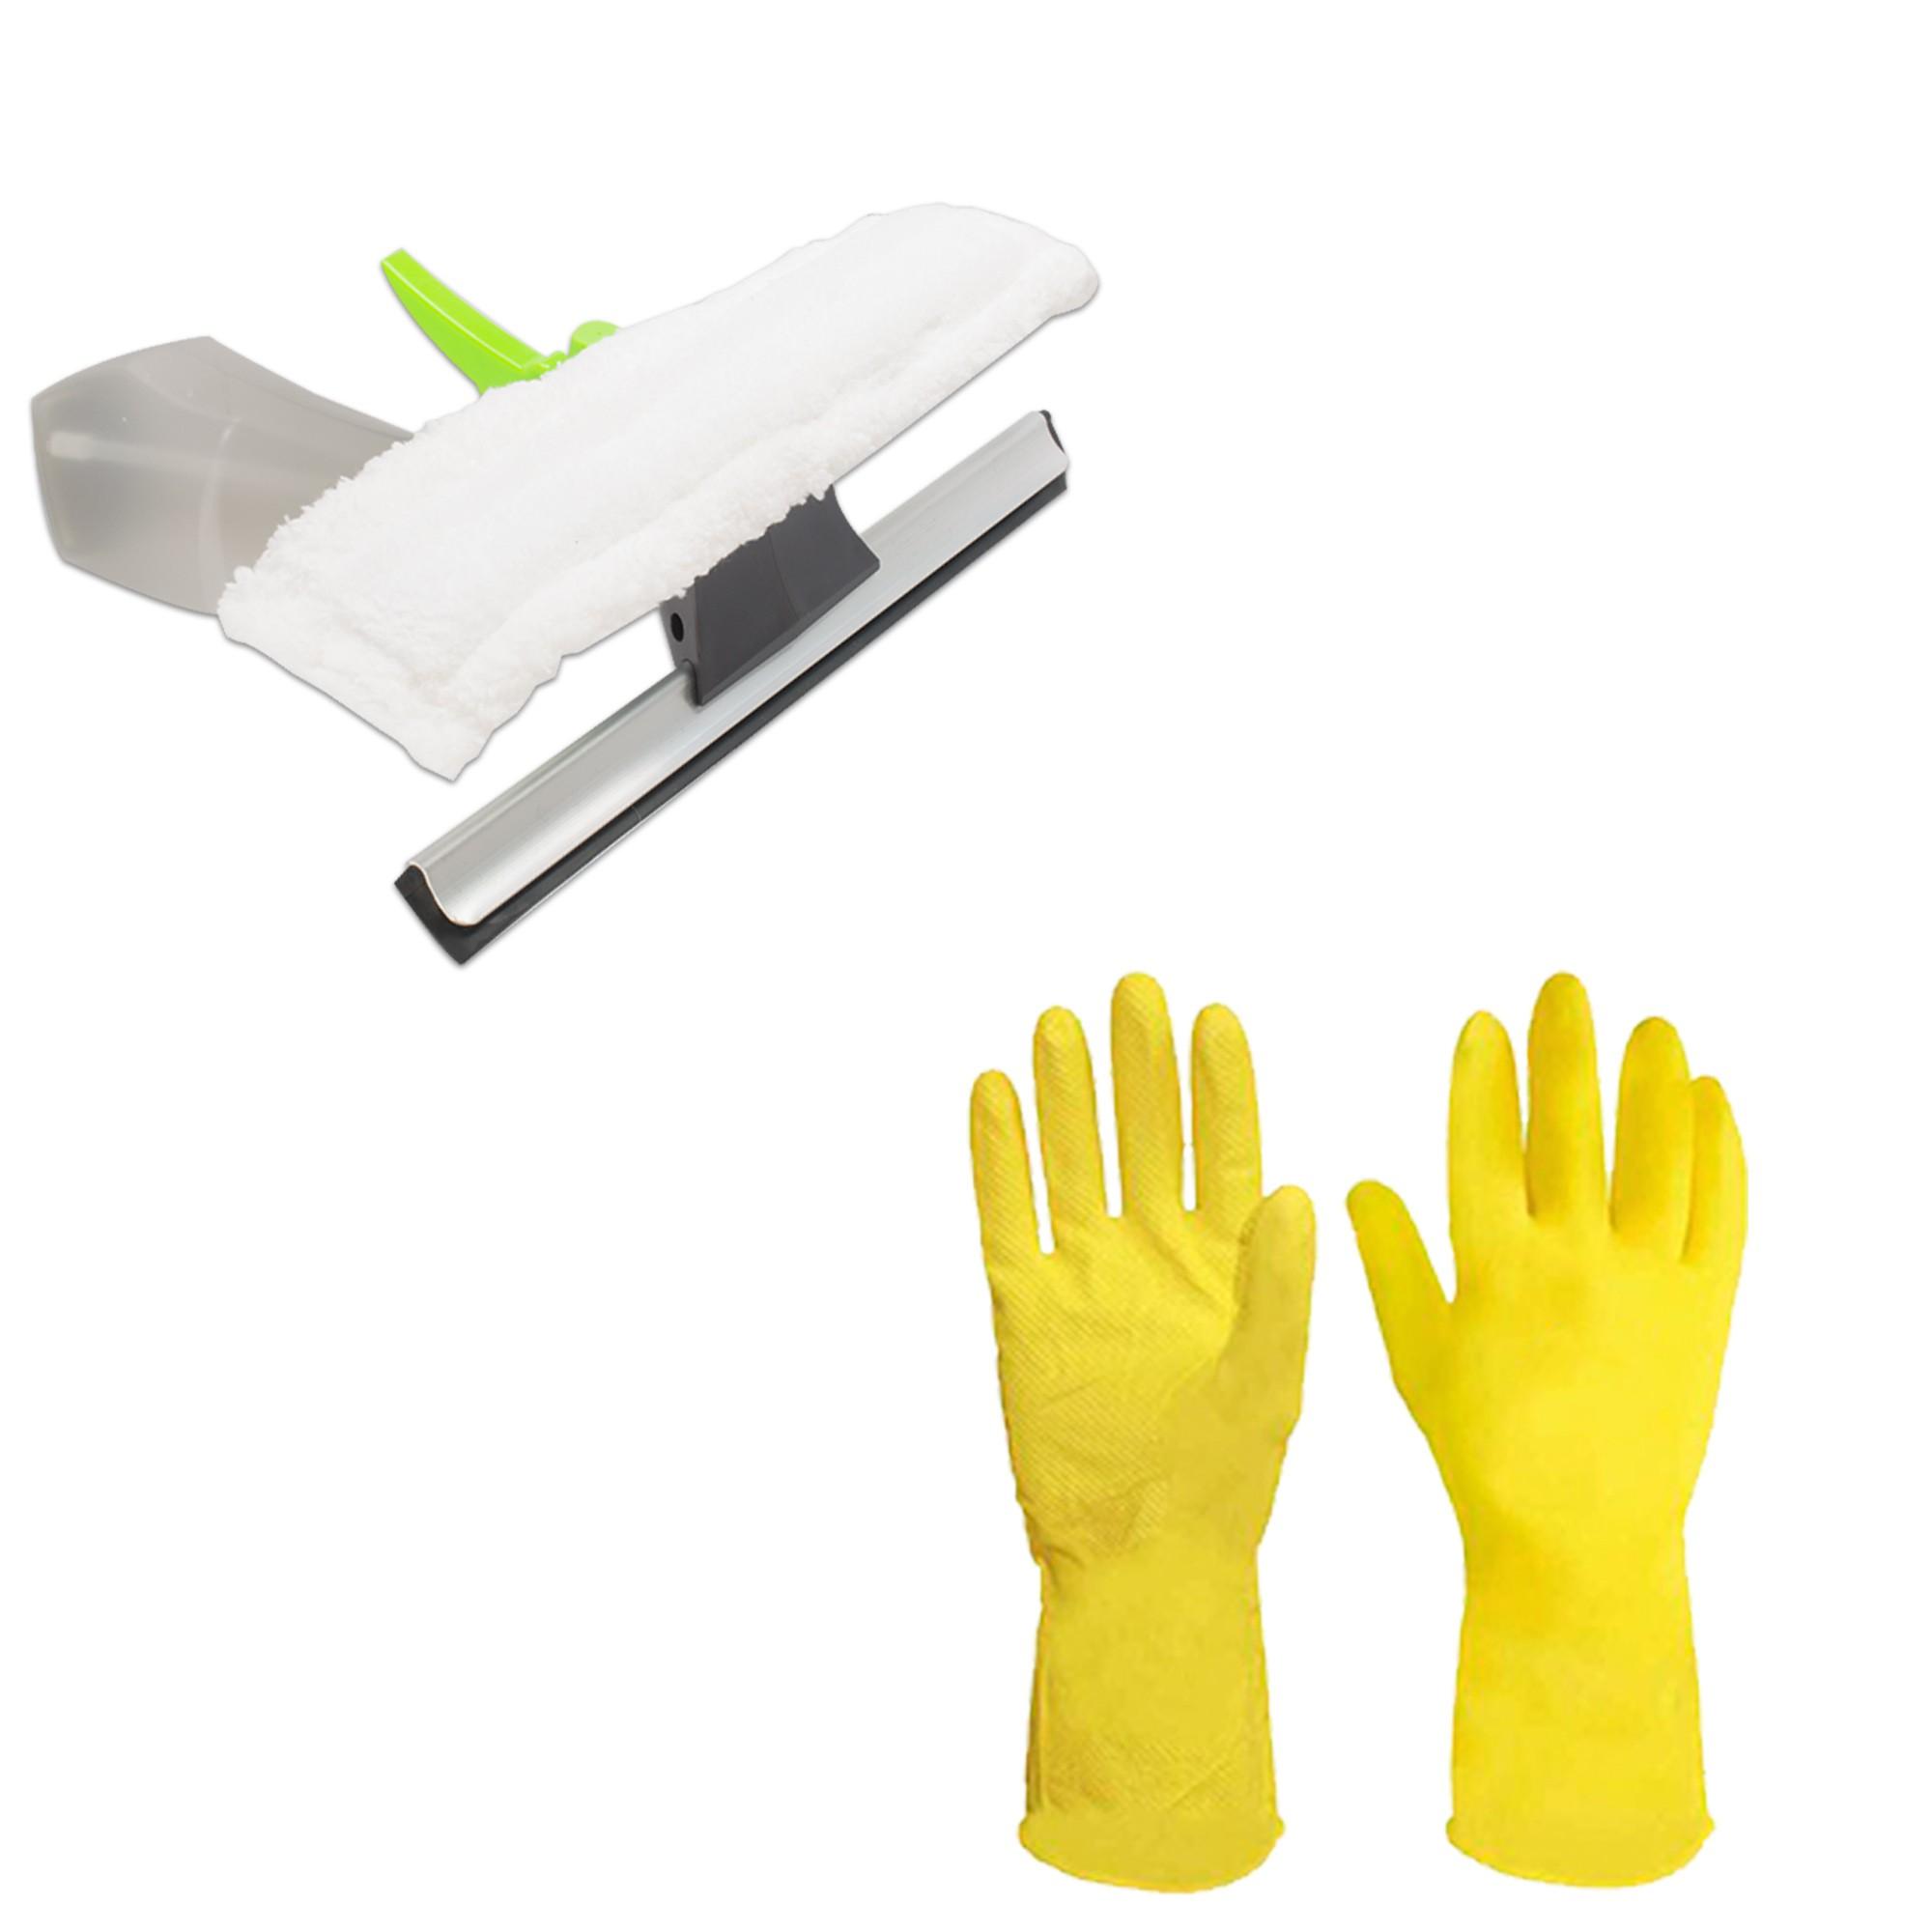 Balde Mop Premium Mor Cesto Inox 2 Refis Limpa Vidros e Luvas